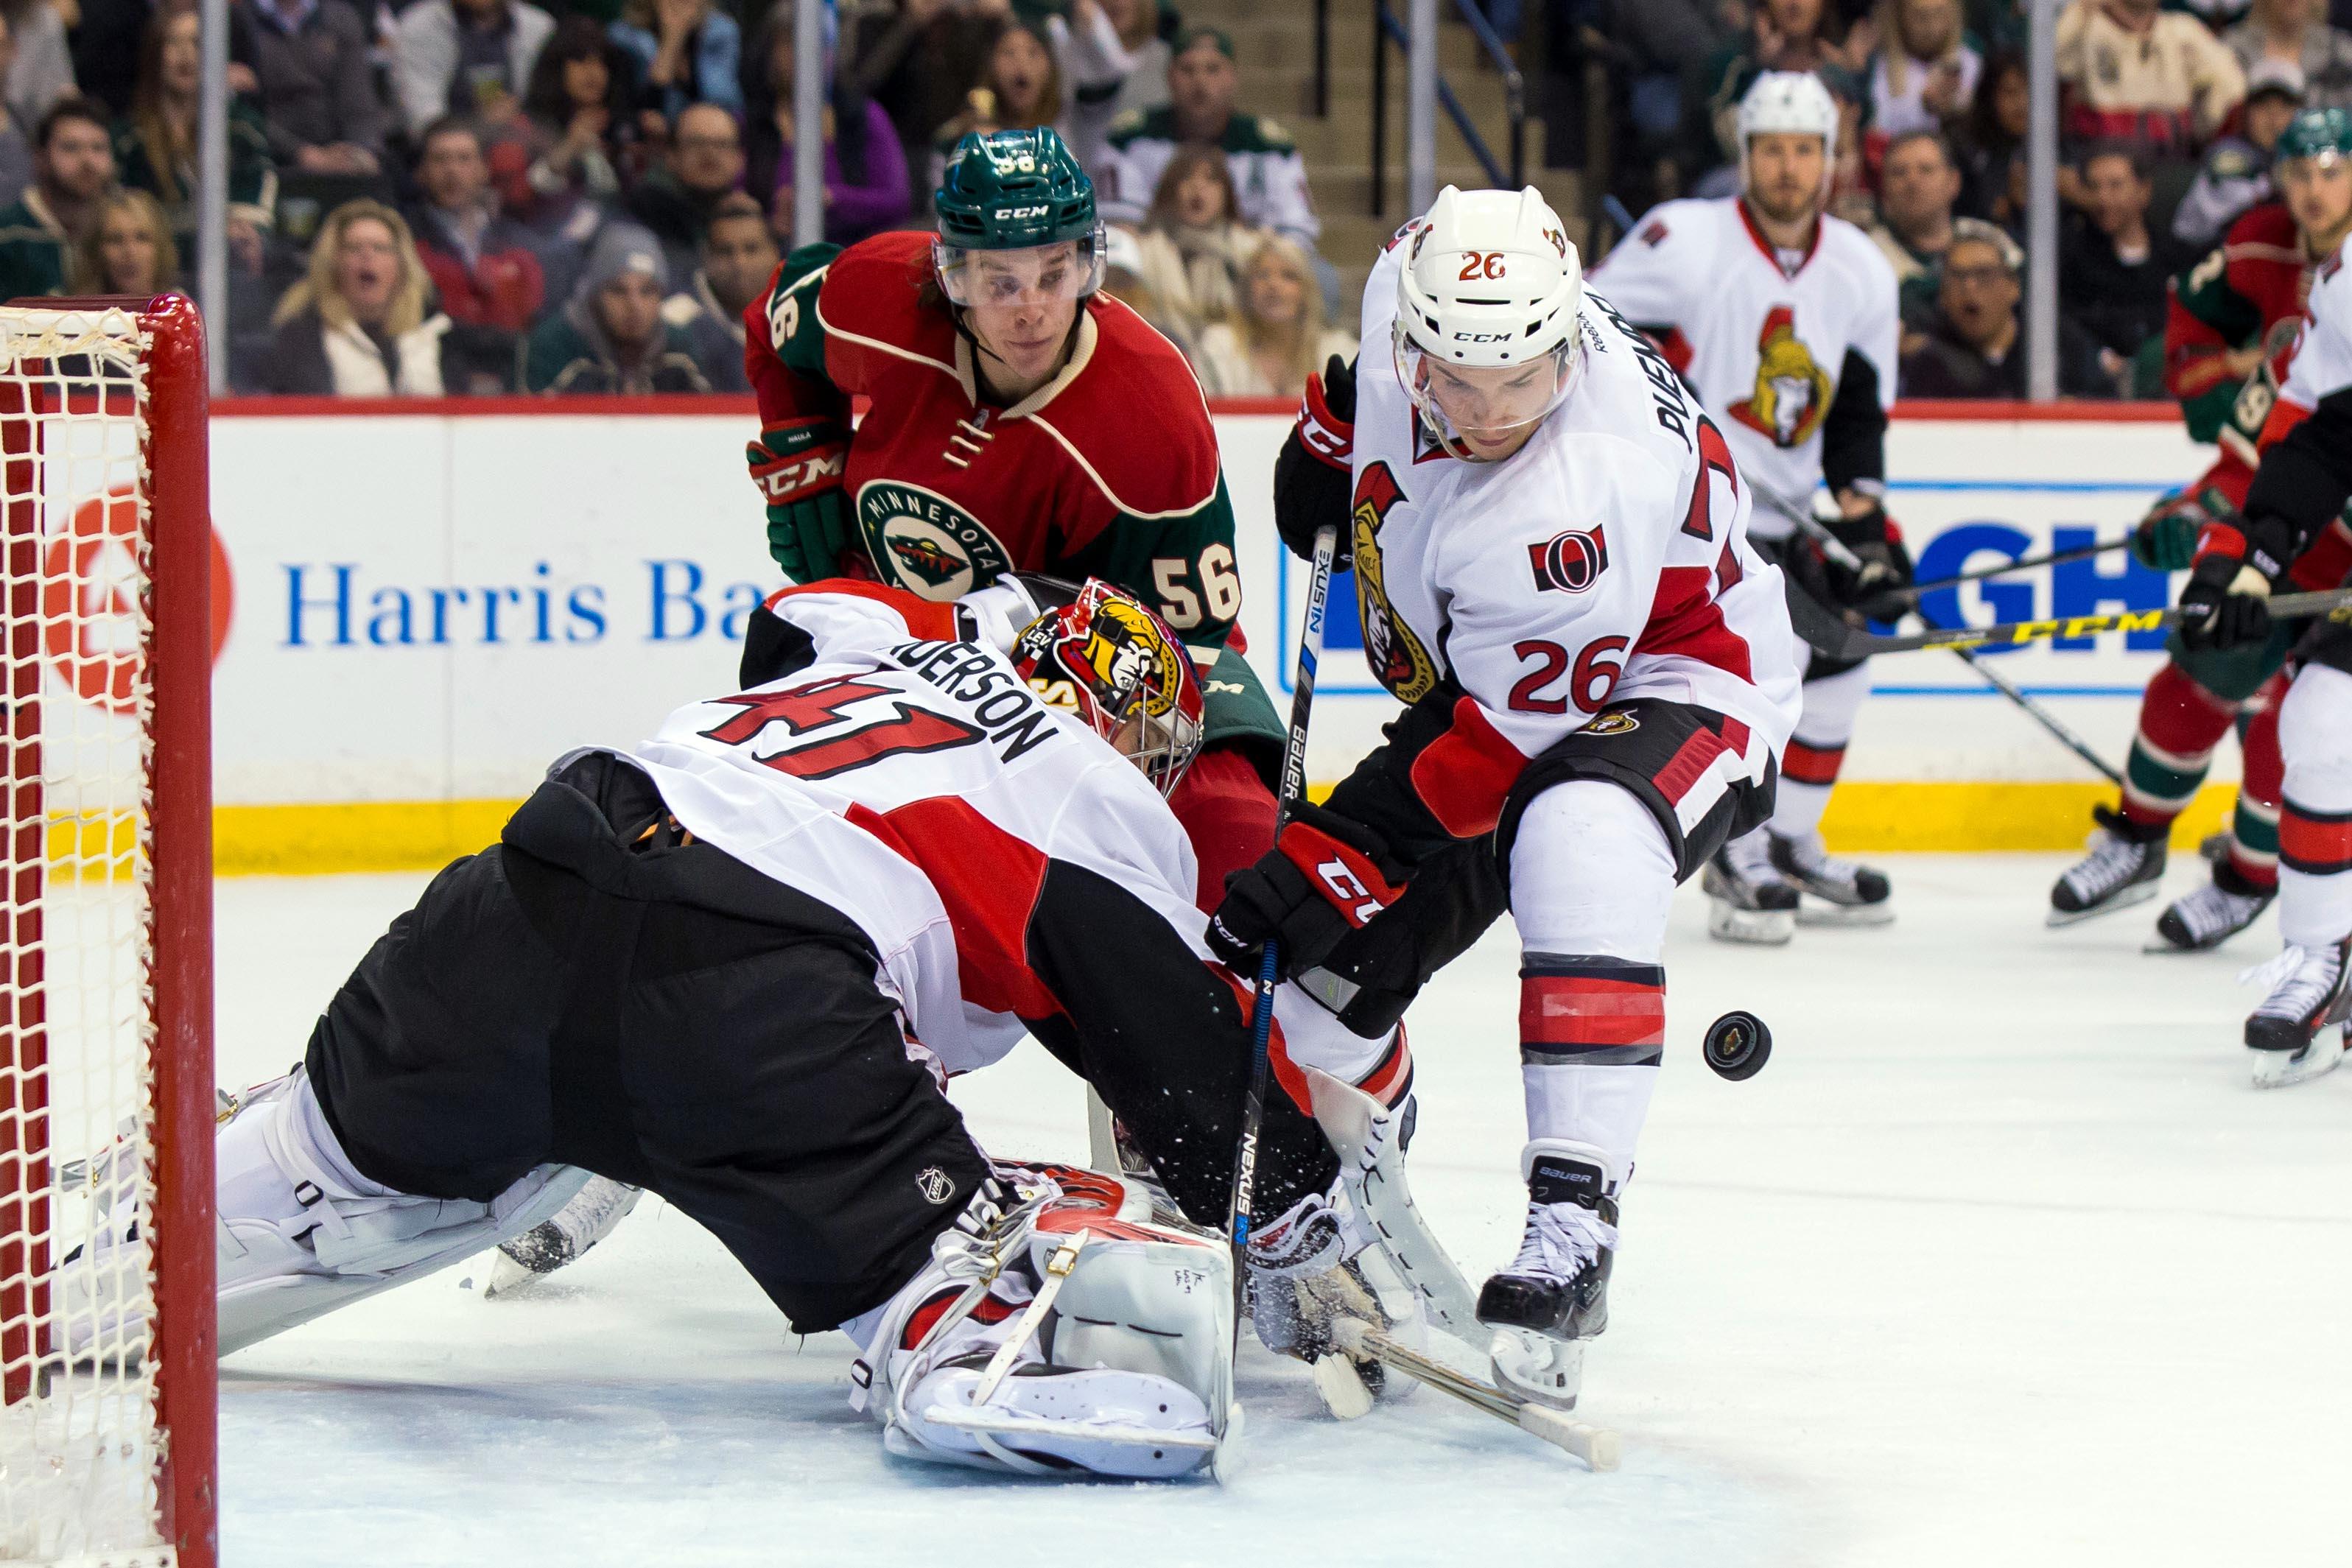 NHL: Ottawa Senators at Minnesota Wild